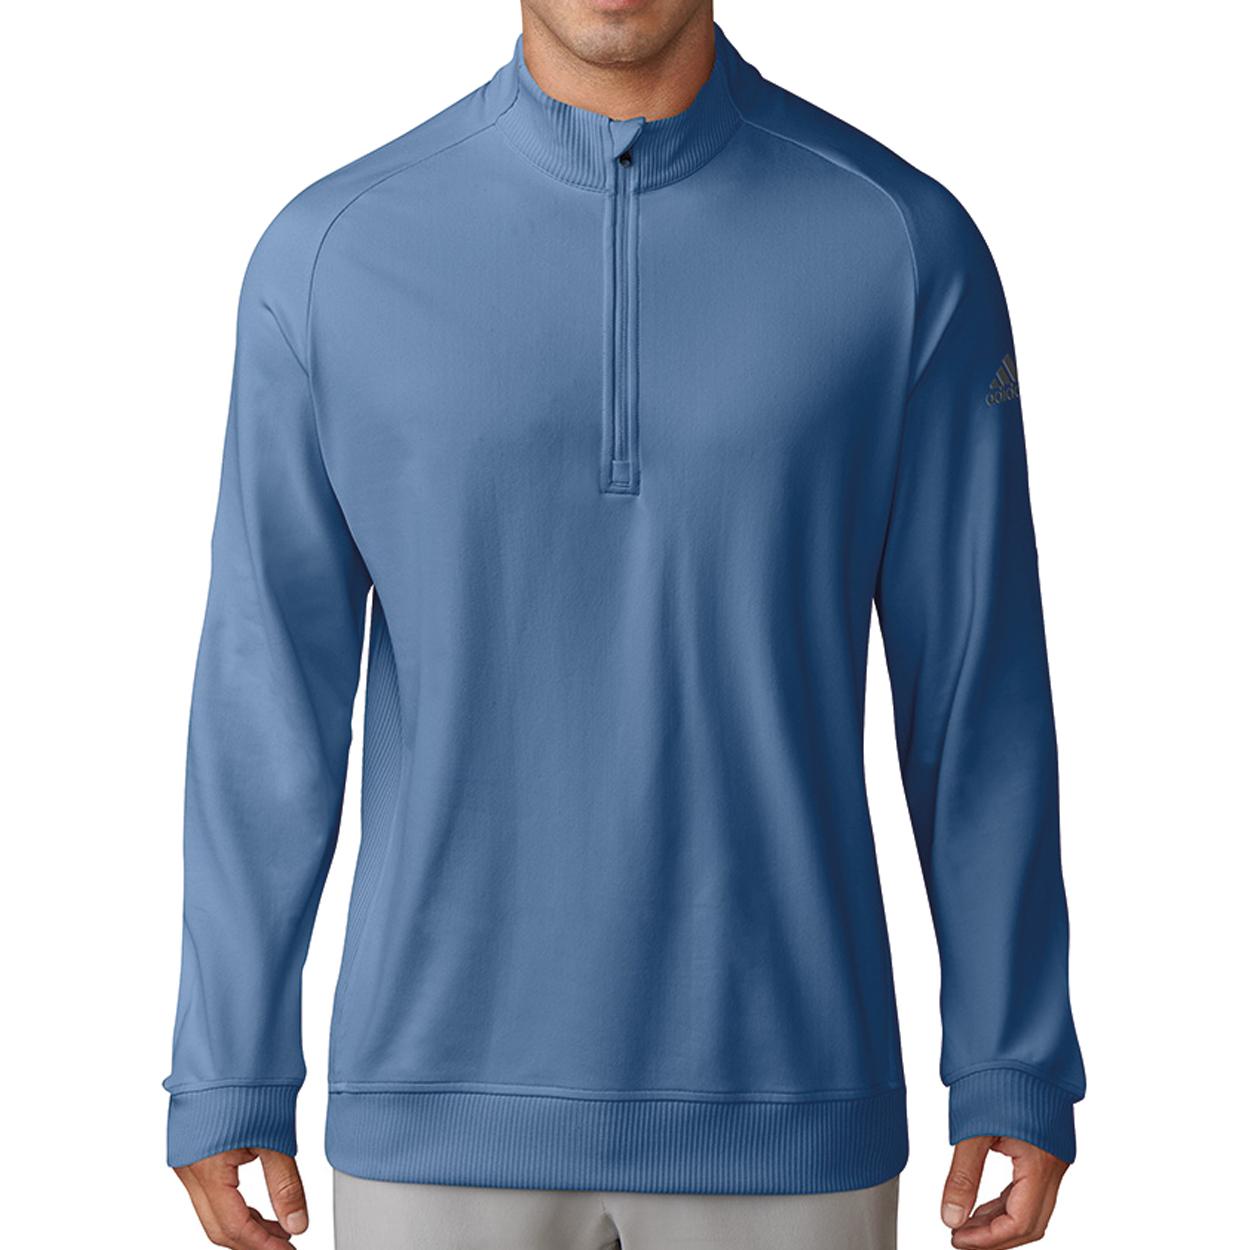 df2a086026ba58 Adidas Classic Club 1 2-Zip Pullover - GolfEtail.com